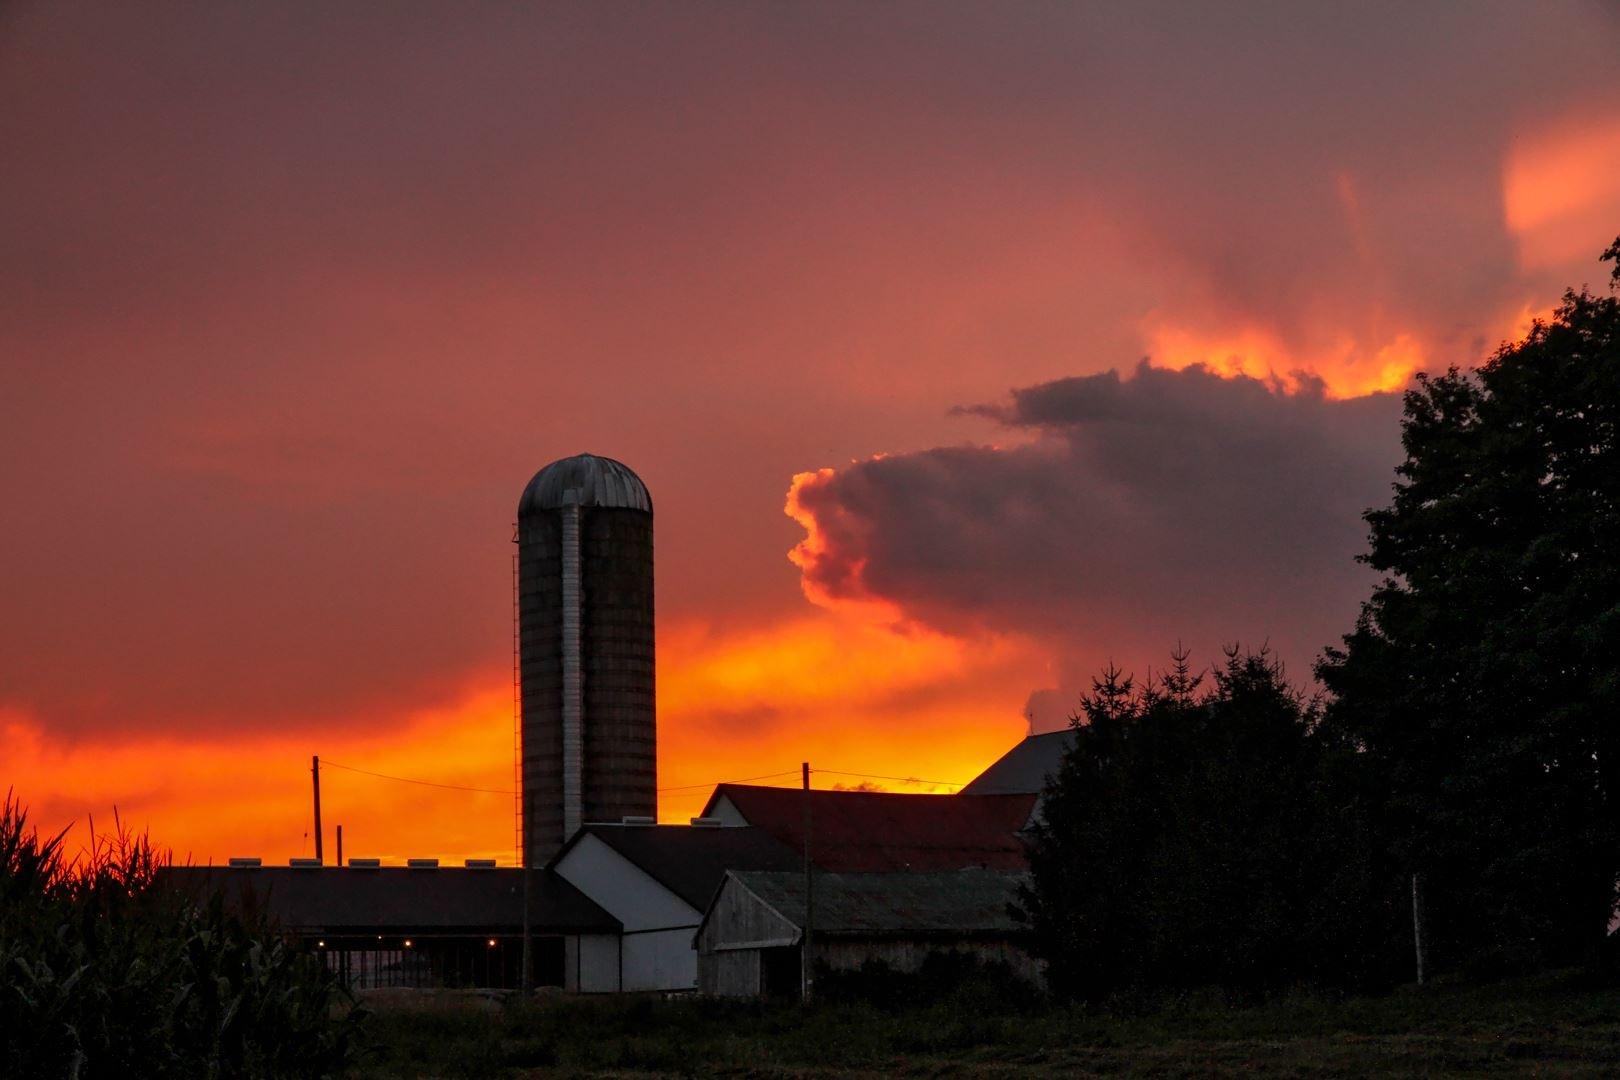 Hell Sunset by El Merrifield